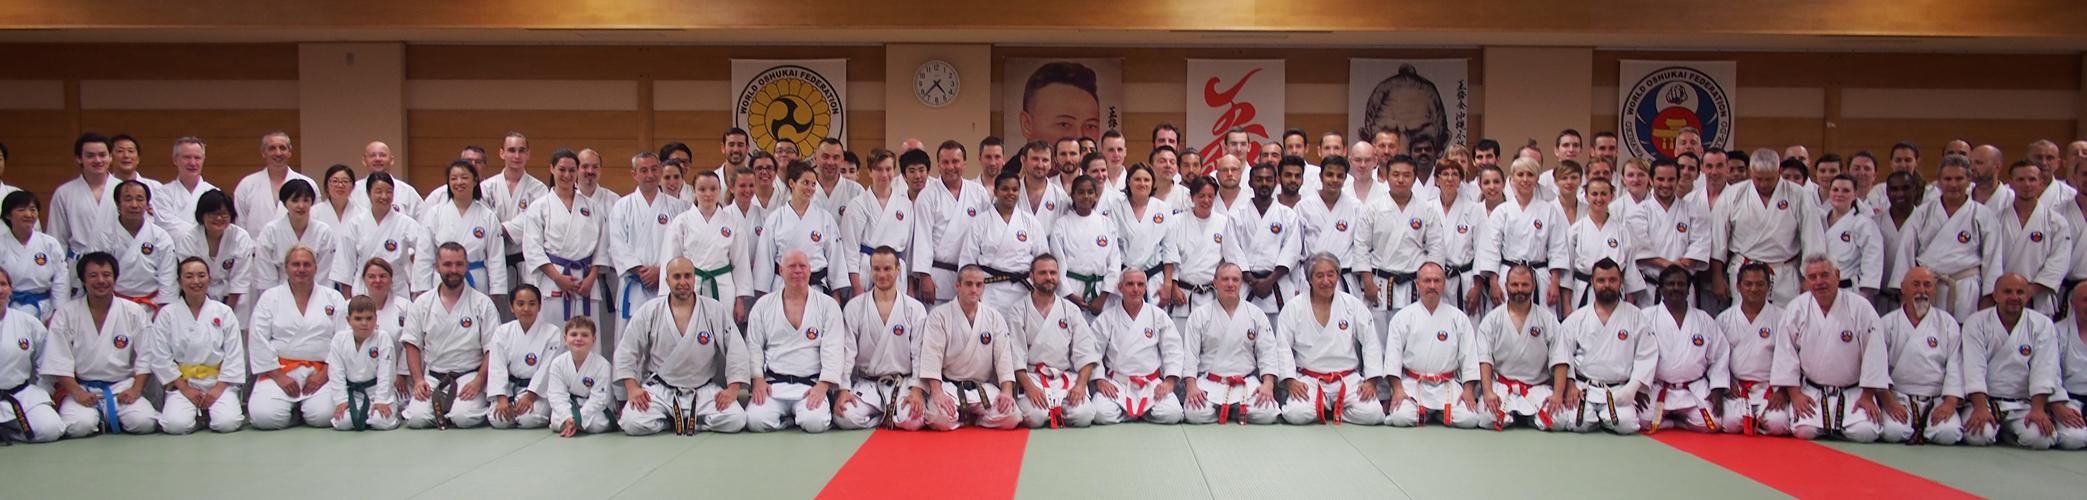 Mezinárodní seminář WOF Okinawa Shorin-ryu Karate & Okinawa Kobudo (11.-12.8.2017, Tokyo) @ Tokyo